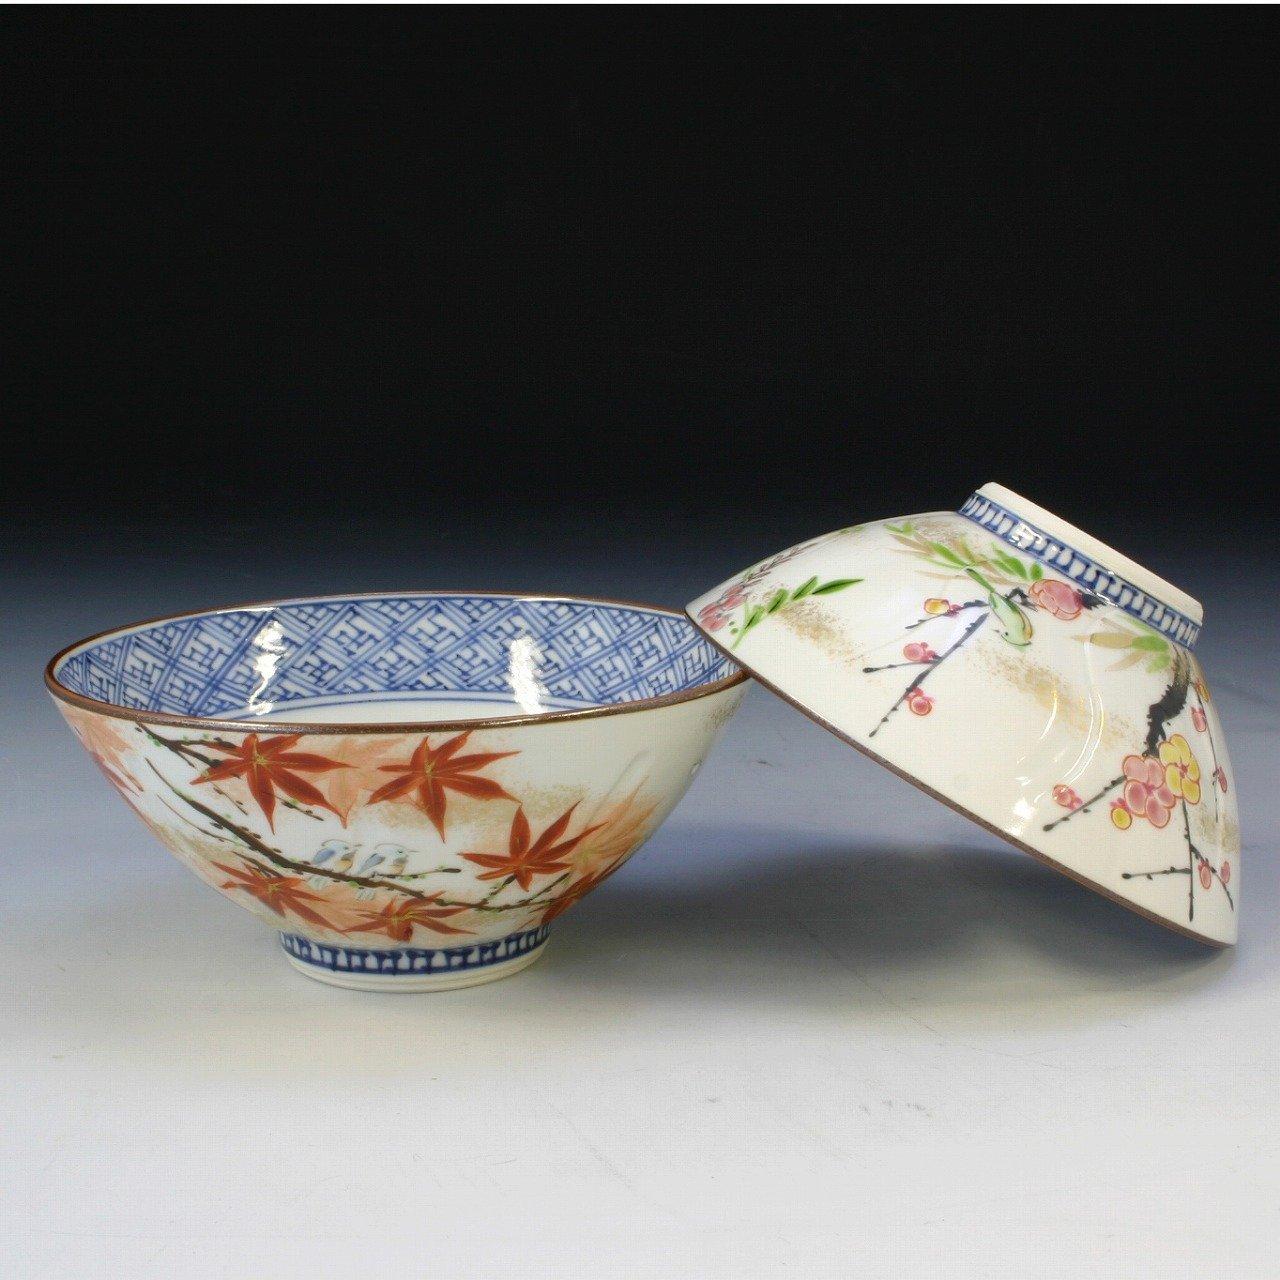 LIS250 清水焼 京焼 夫婦茶碗 飯碗 ギフト彩花鳥 組   B006M07TYC